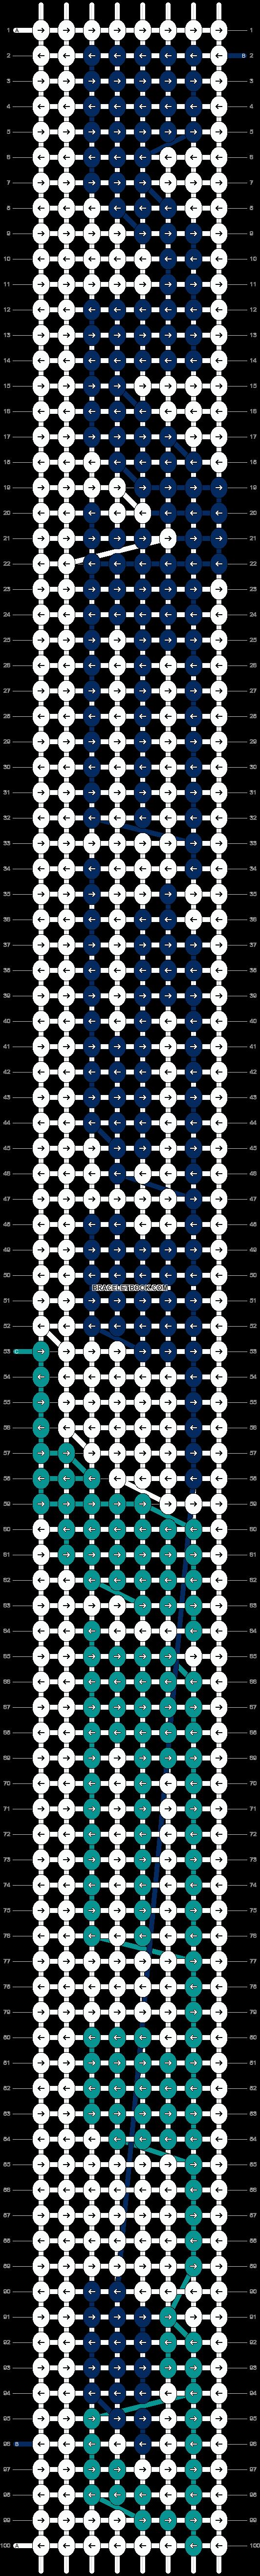 Alpha pattern #1123 pattern